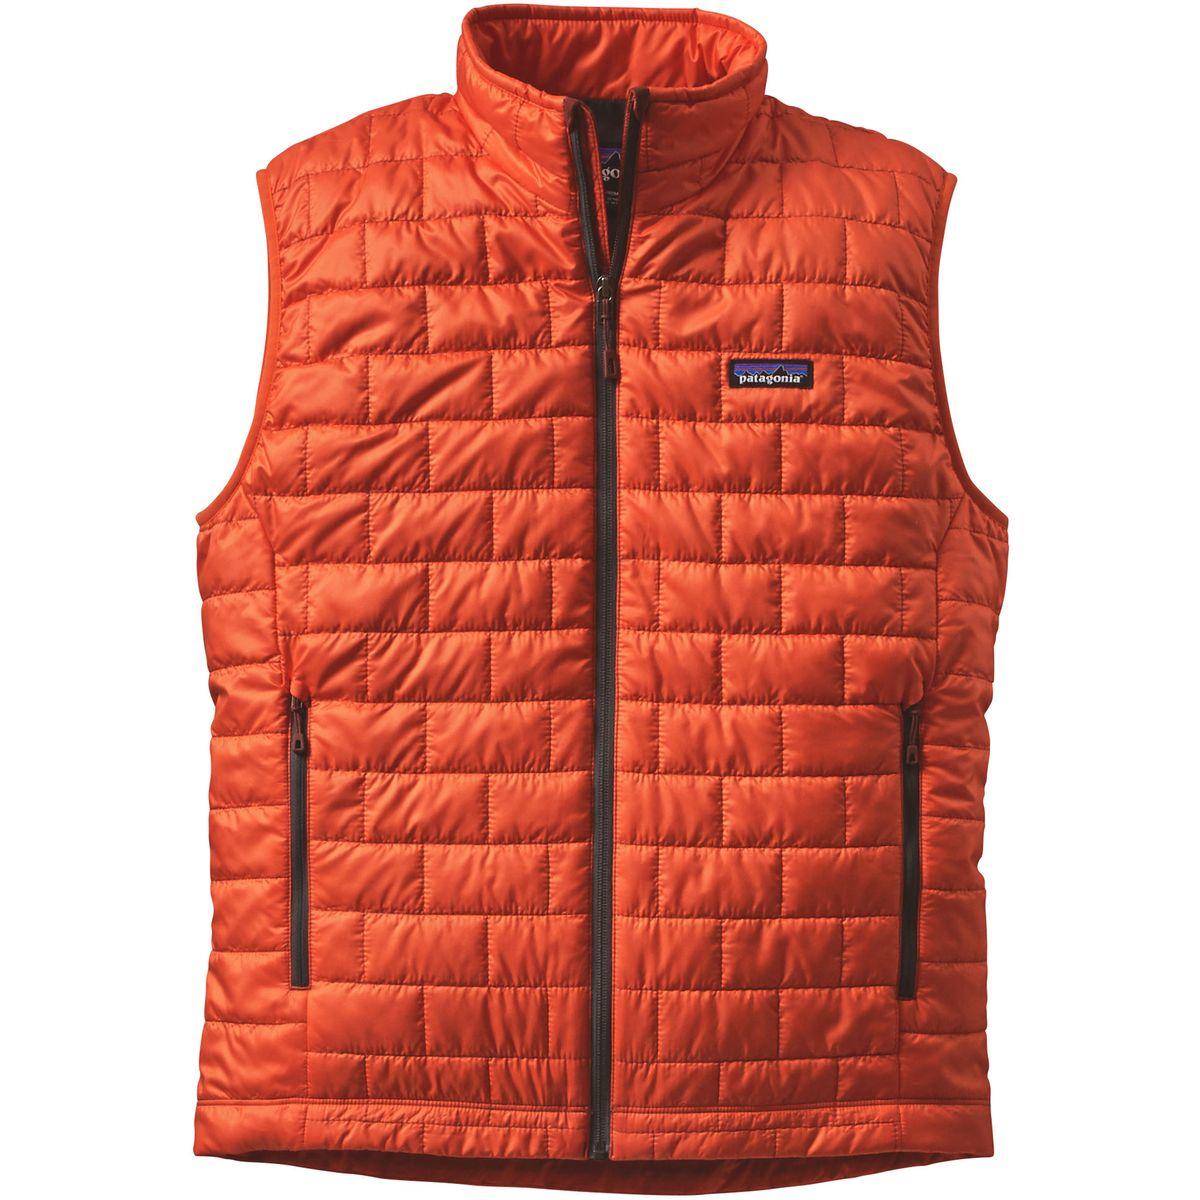 Patagonia Nano Puff Vest - Men